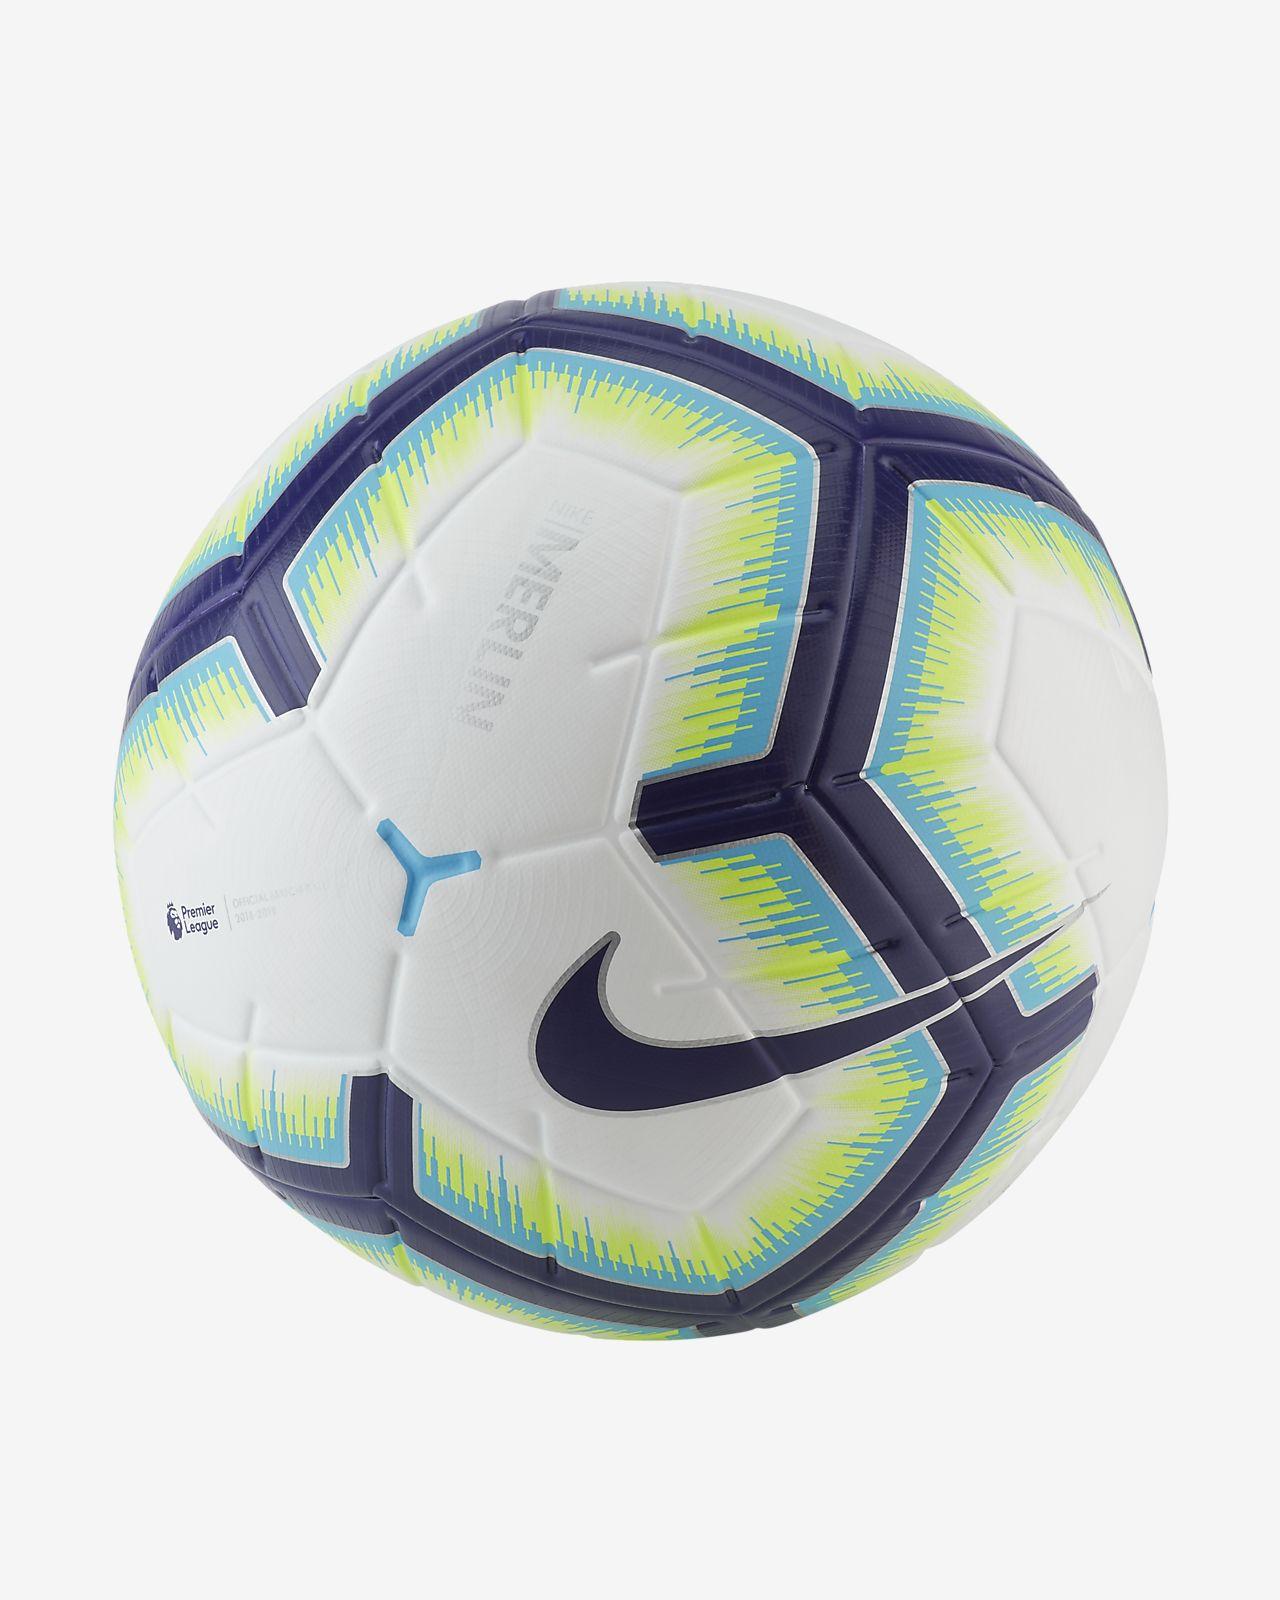 promo code f1045 16c33 Football. Premier League Merlin